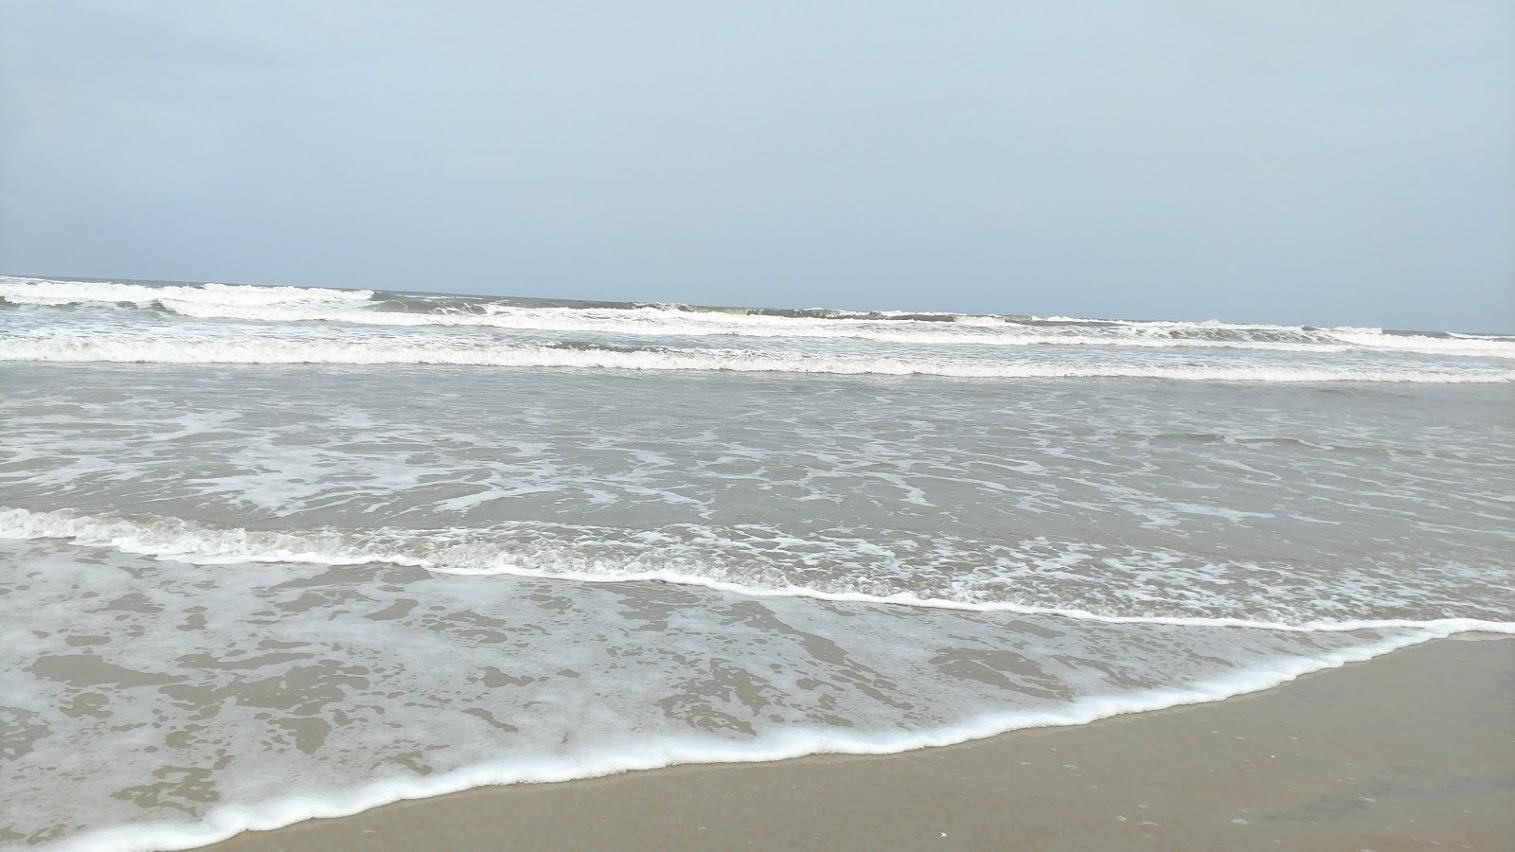 The Arabian Sea in Goa